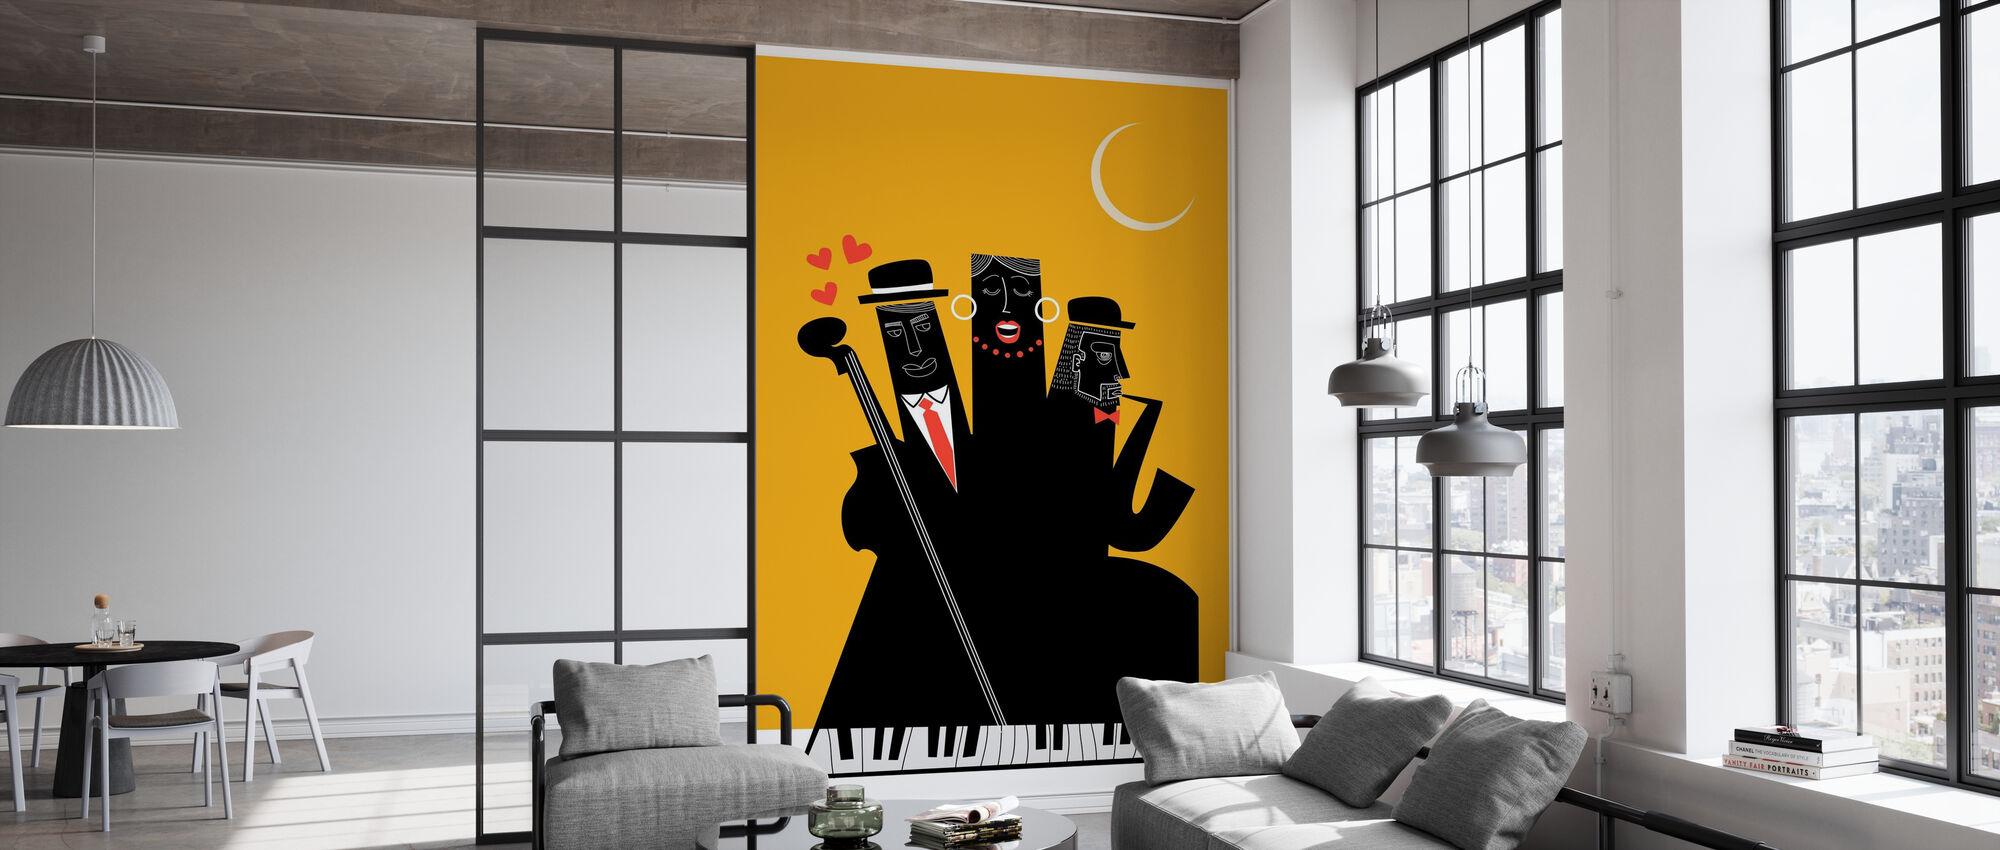 Jazzy Nights - Wallpaper - Office